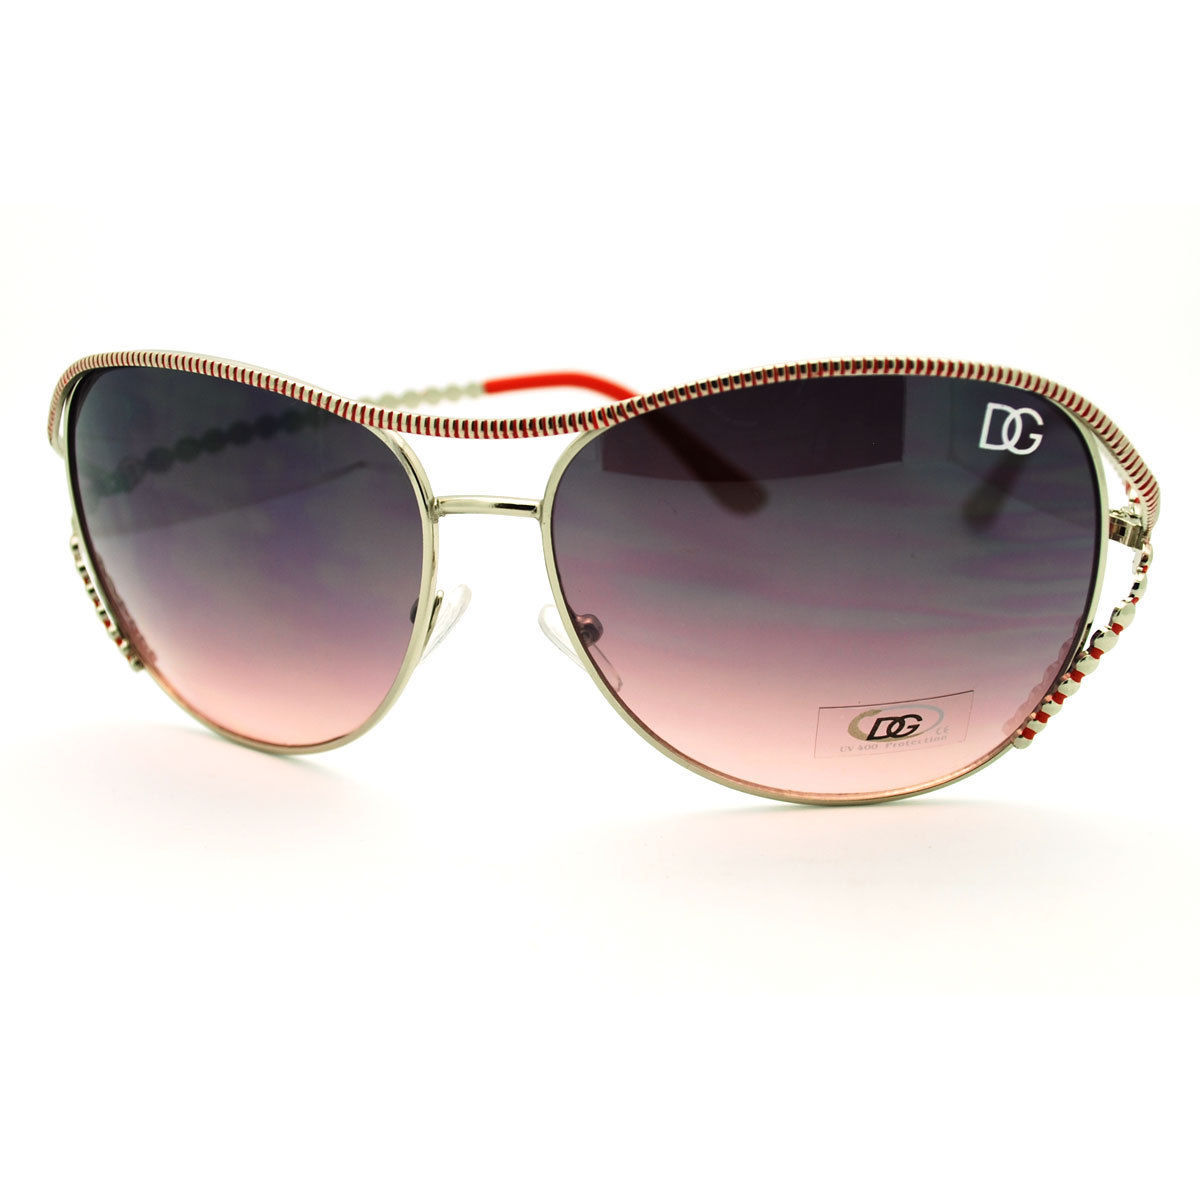 Womens Oversized Round Sunglasses Stylish Unique Metal Beaded Look